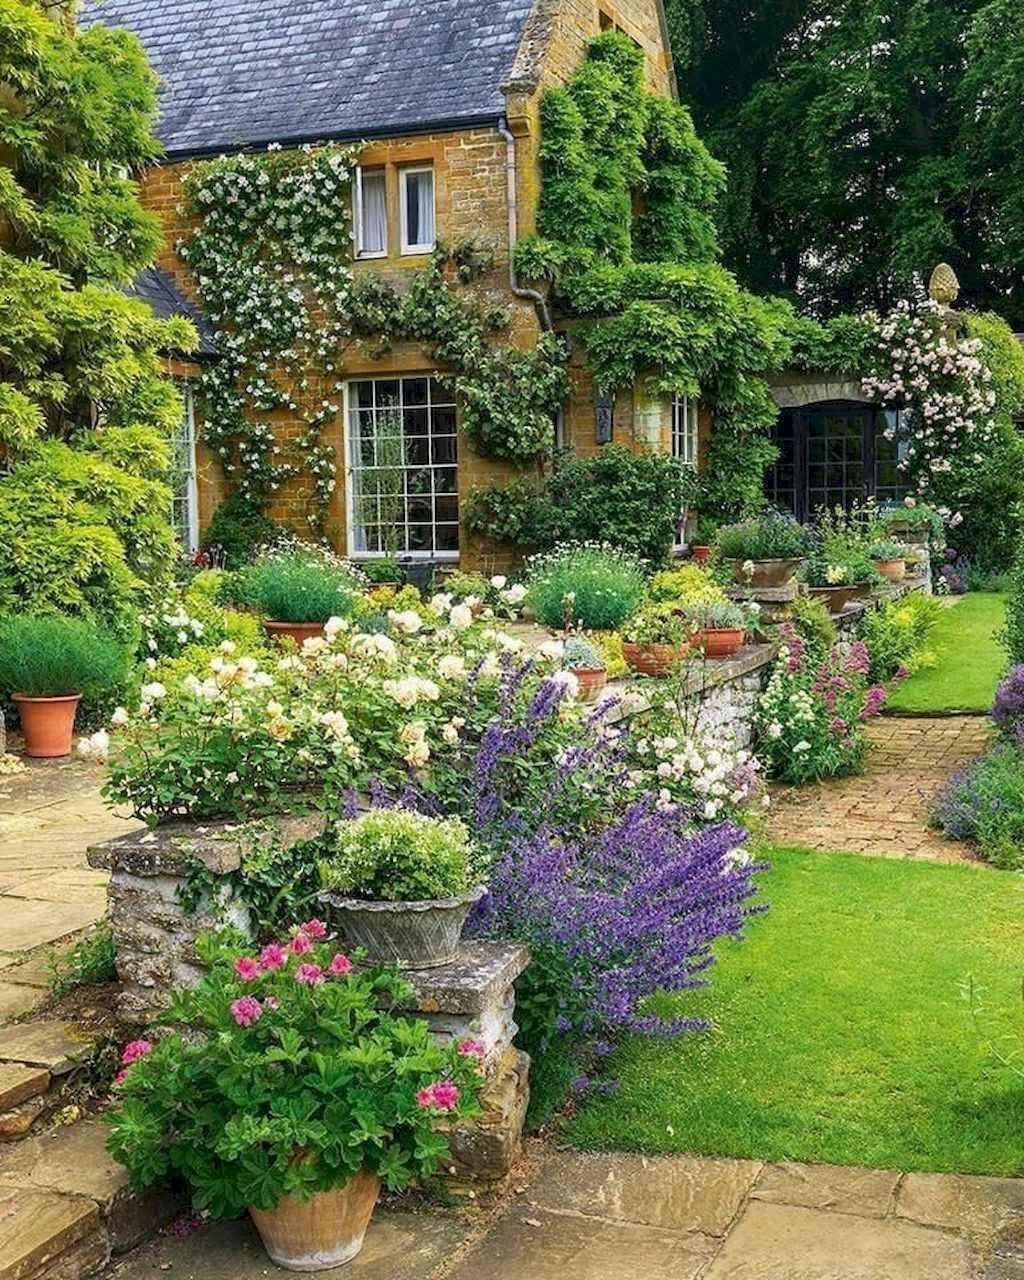 57 Amazing Beautiful Garden Ideas Inspiration And: 05 Stunning Front Yard Cottage Garden Inspiration Ideas